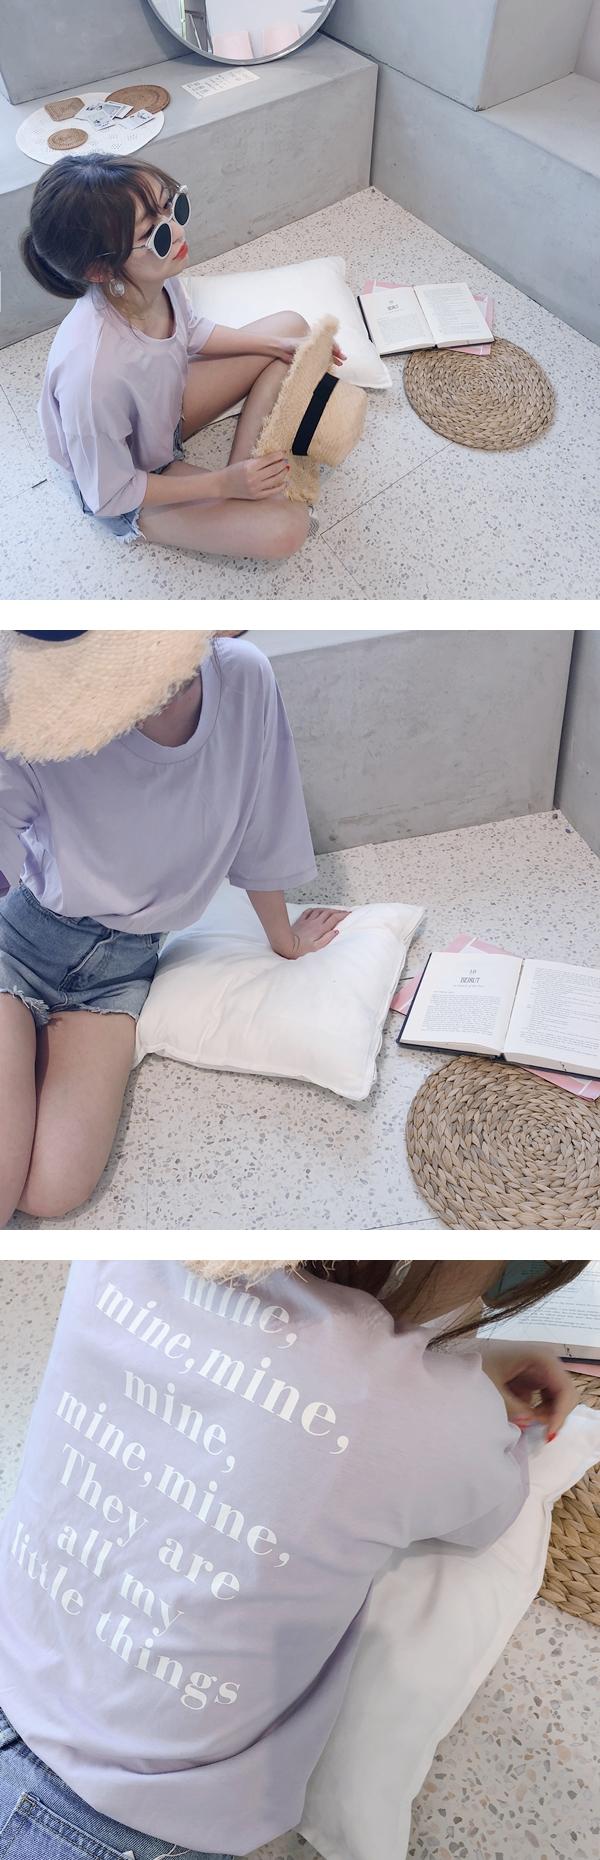 PAZZO小羊A'a系列 (7).jpg